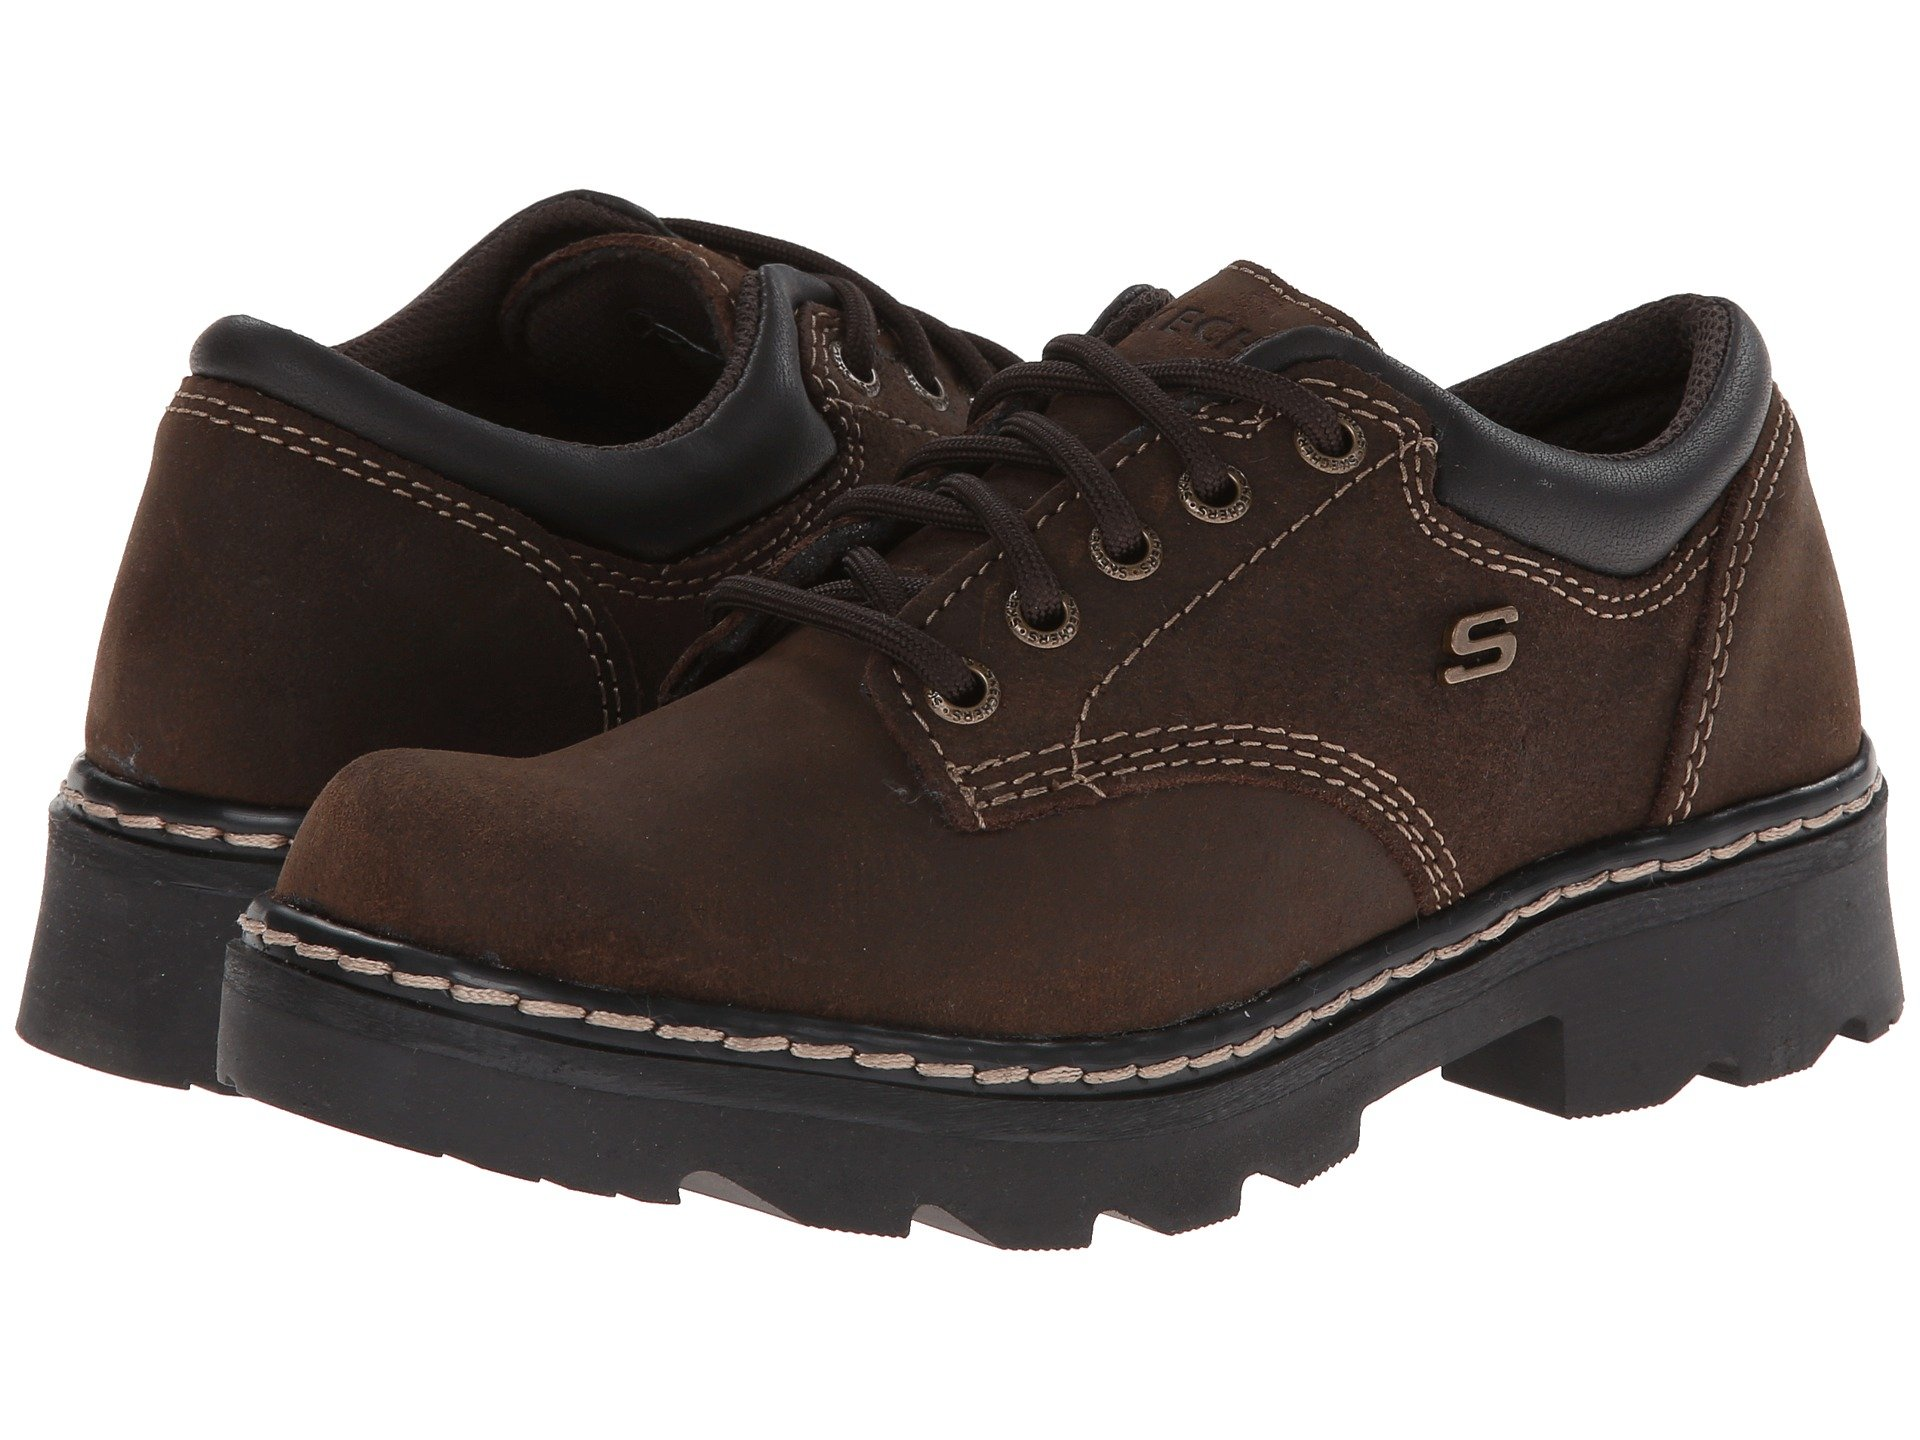 Zapato Casual para Mujer SKECHERS Parties - Mate  + SKECHERS en VeoyCompro.net